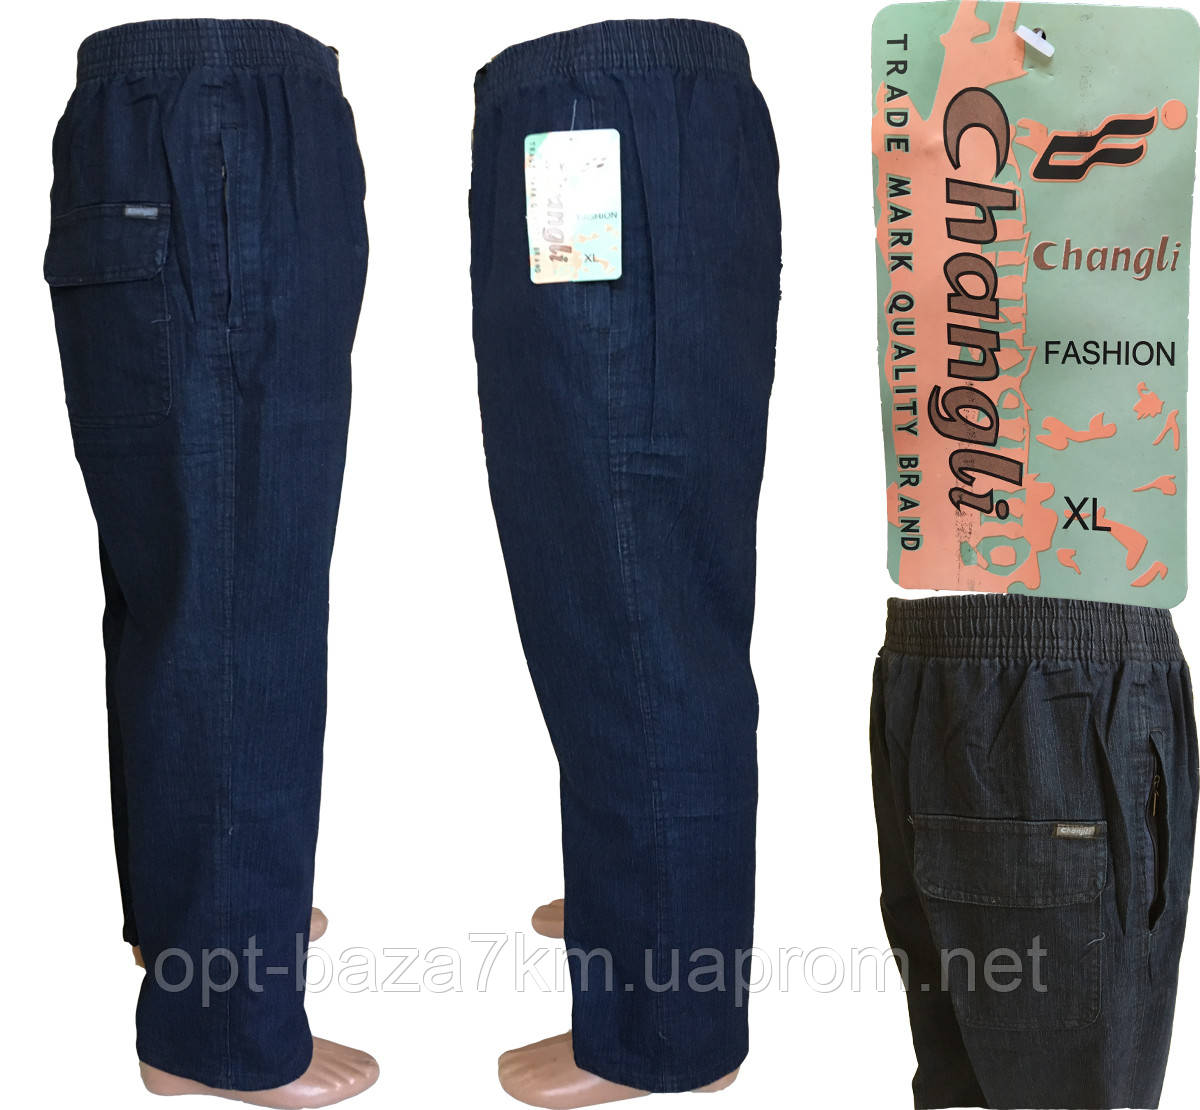 e9d286a237d2 Спортивные штаны мужские оптом Changli - прямые (XL-5XL батал) Китай ...